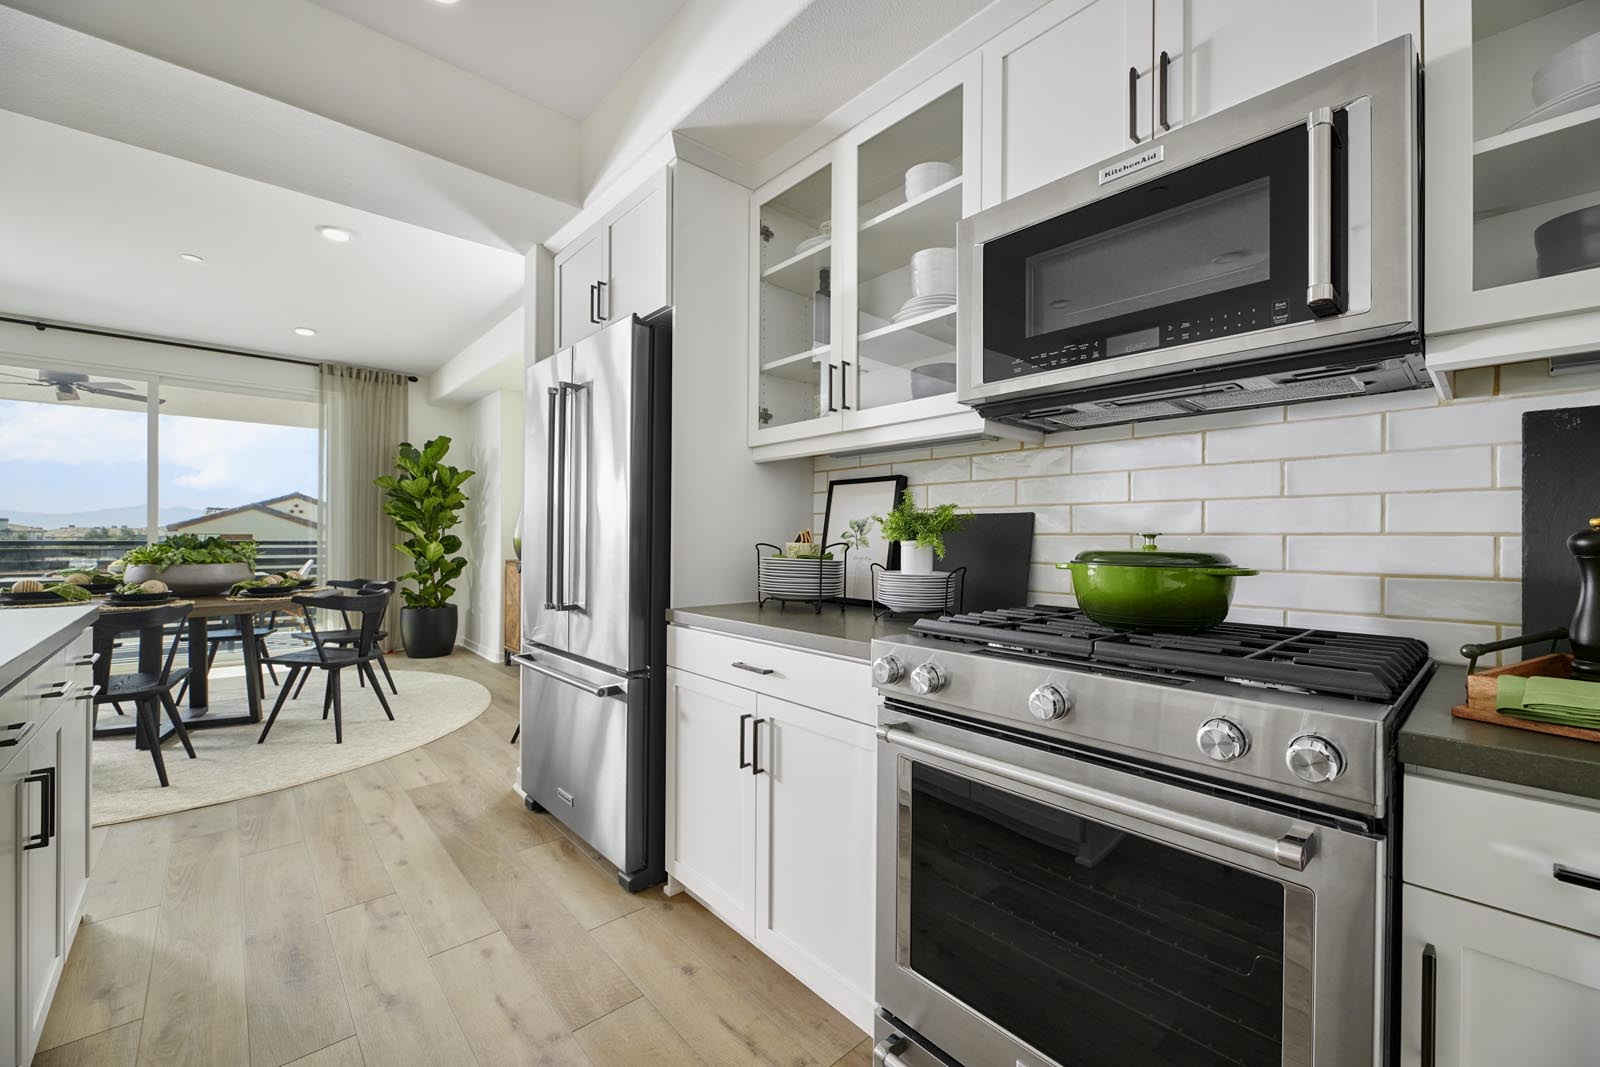 Kitchen   Residence 3   Aspire   New Homes in Rancho Cucamonga, CA   Van Daele Homes